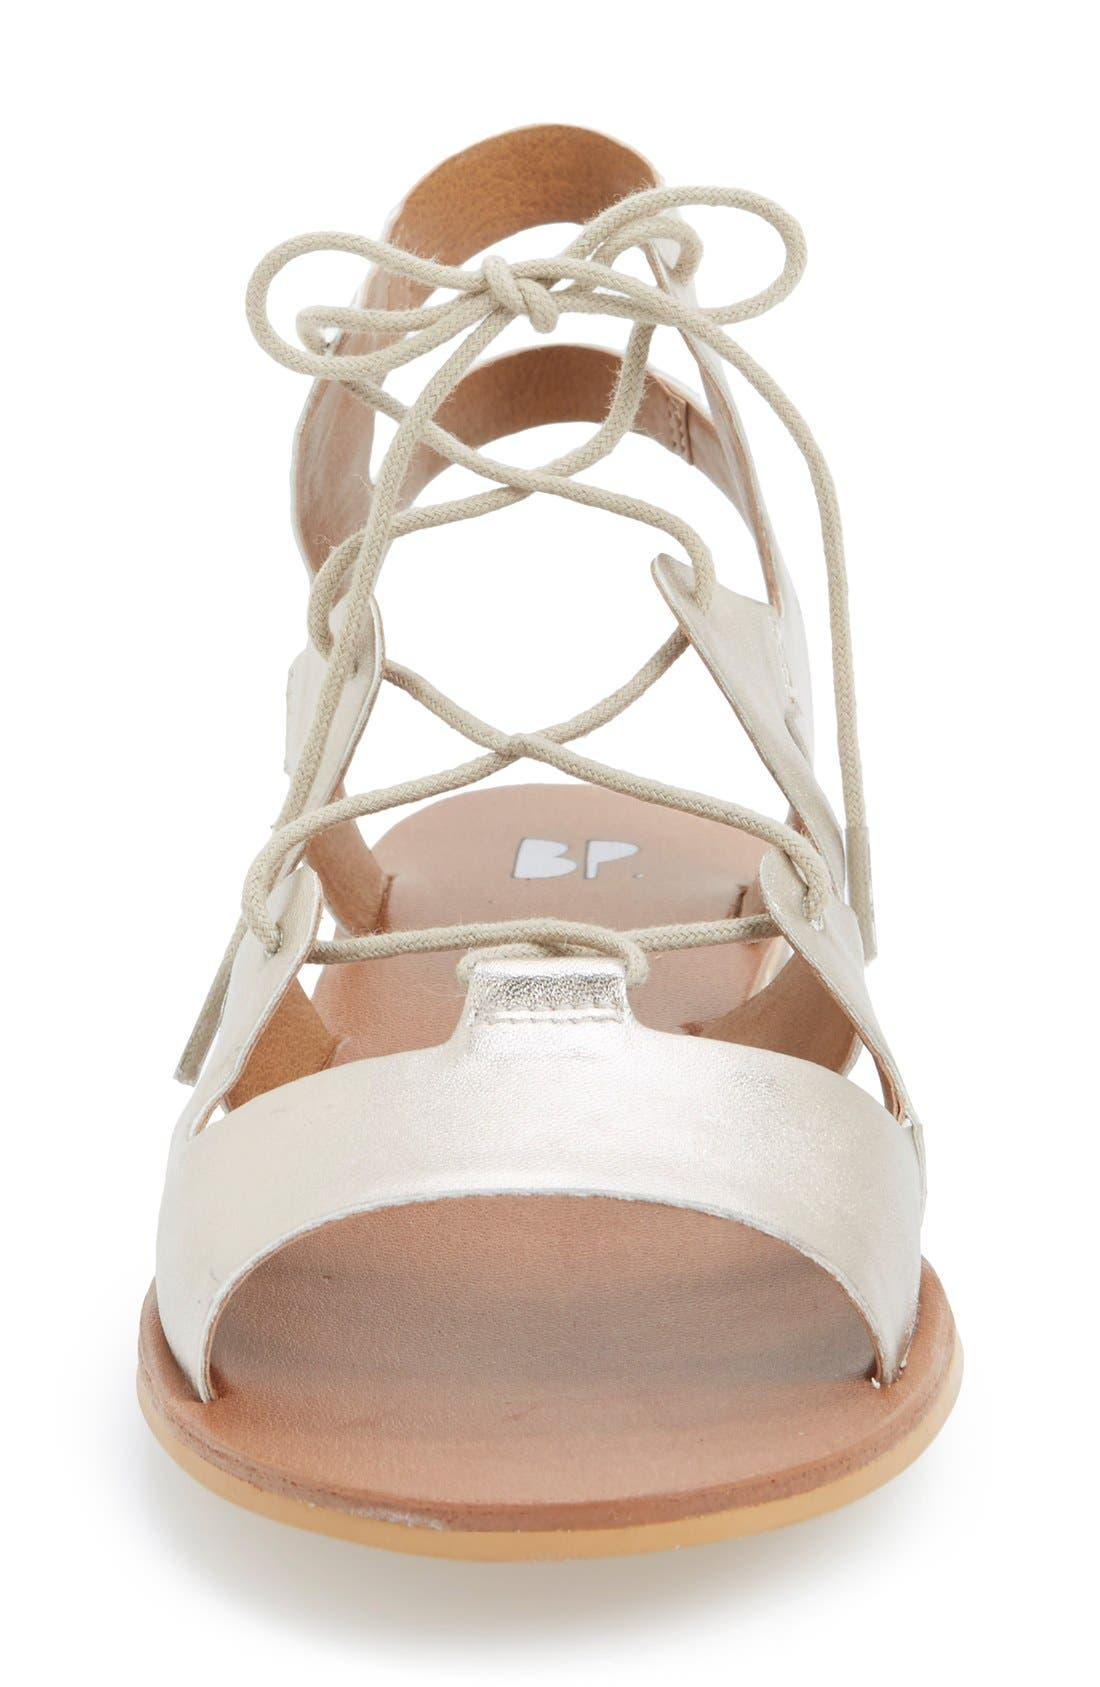 'Alyona' Lace-Up Gladiator Sandal,                             Alternate thumbnail 3, color,                             Platinum Faux Leather